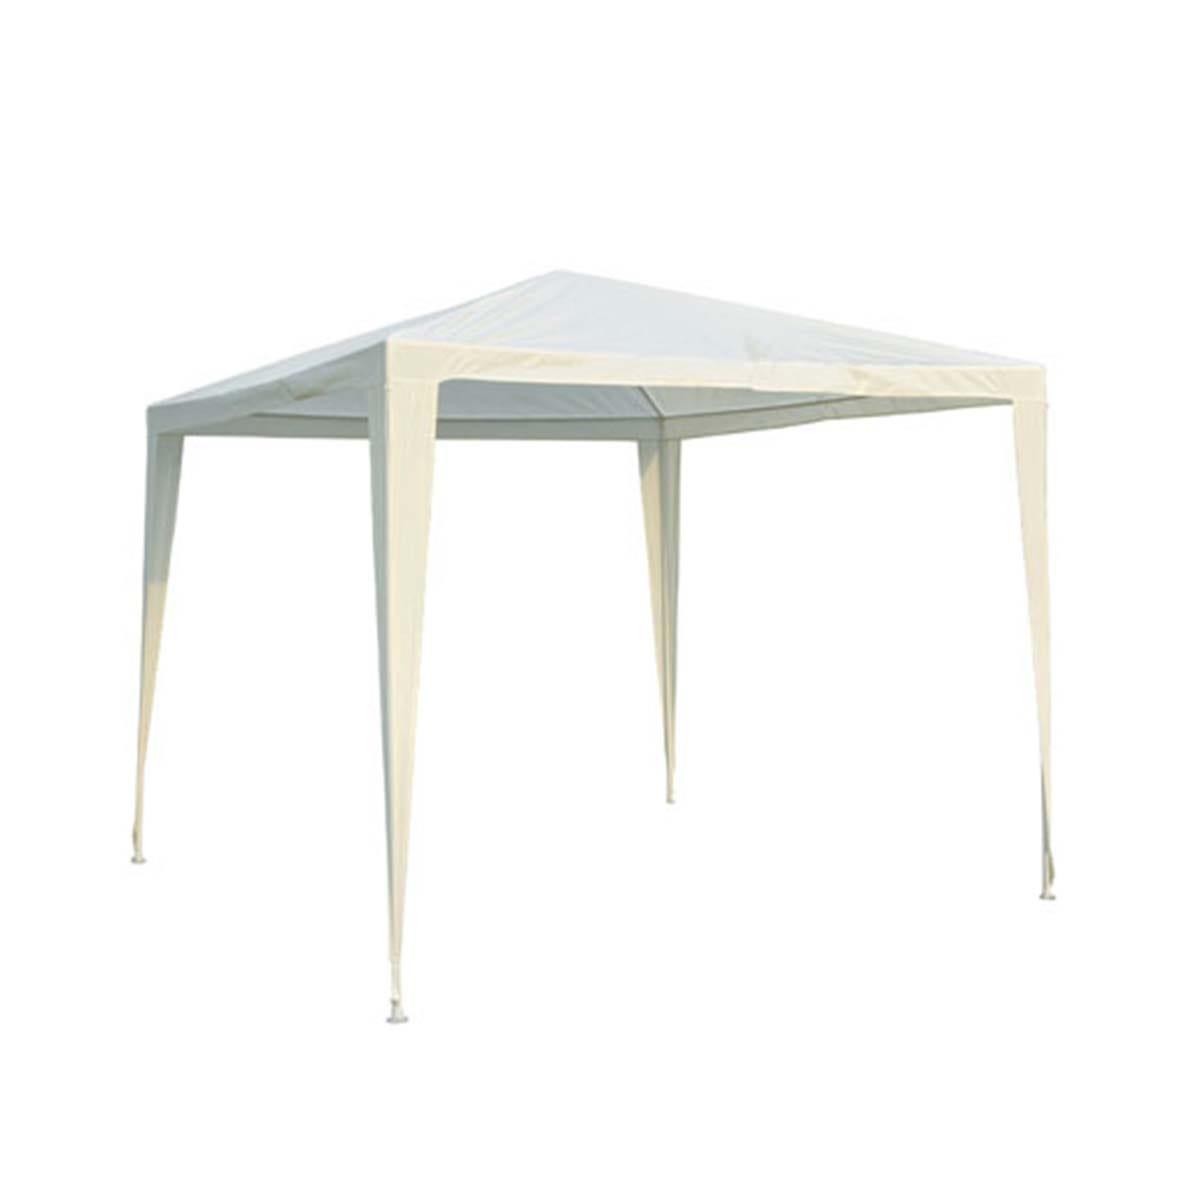 Outsunny 2.7 x 2.7m Garden Gazebo - White